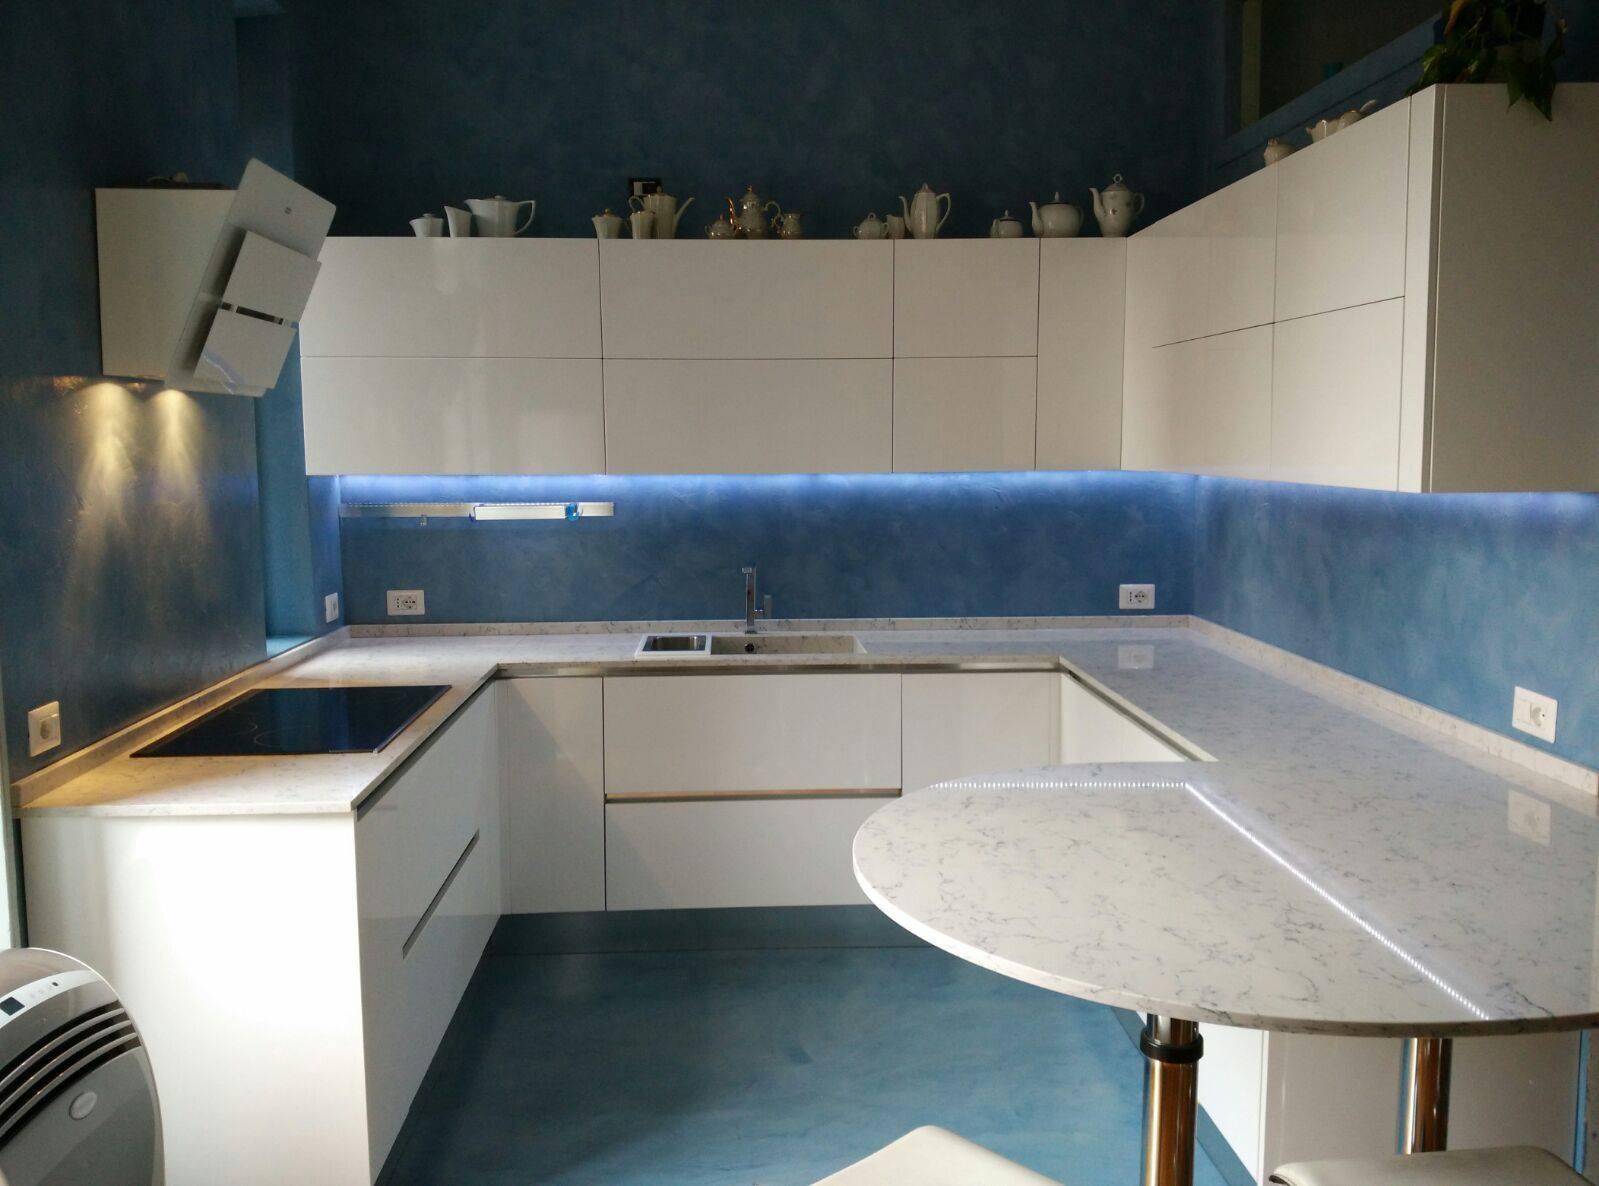 Vernice piastrelle. vernice per piastrelle cucina idee di design per